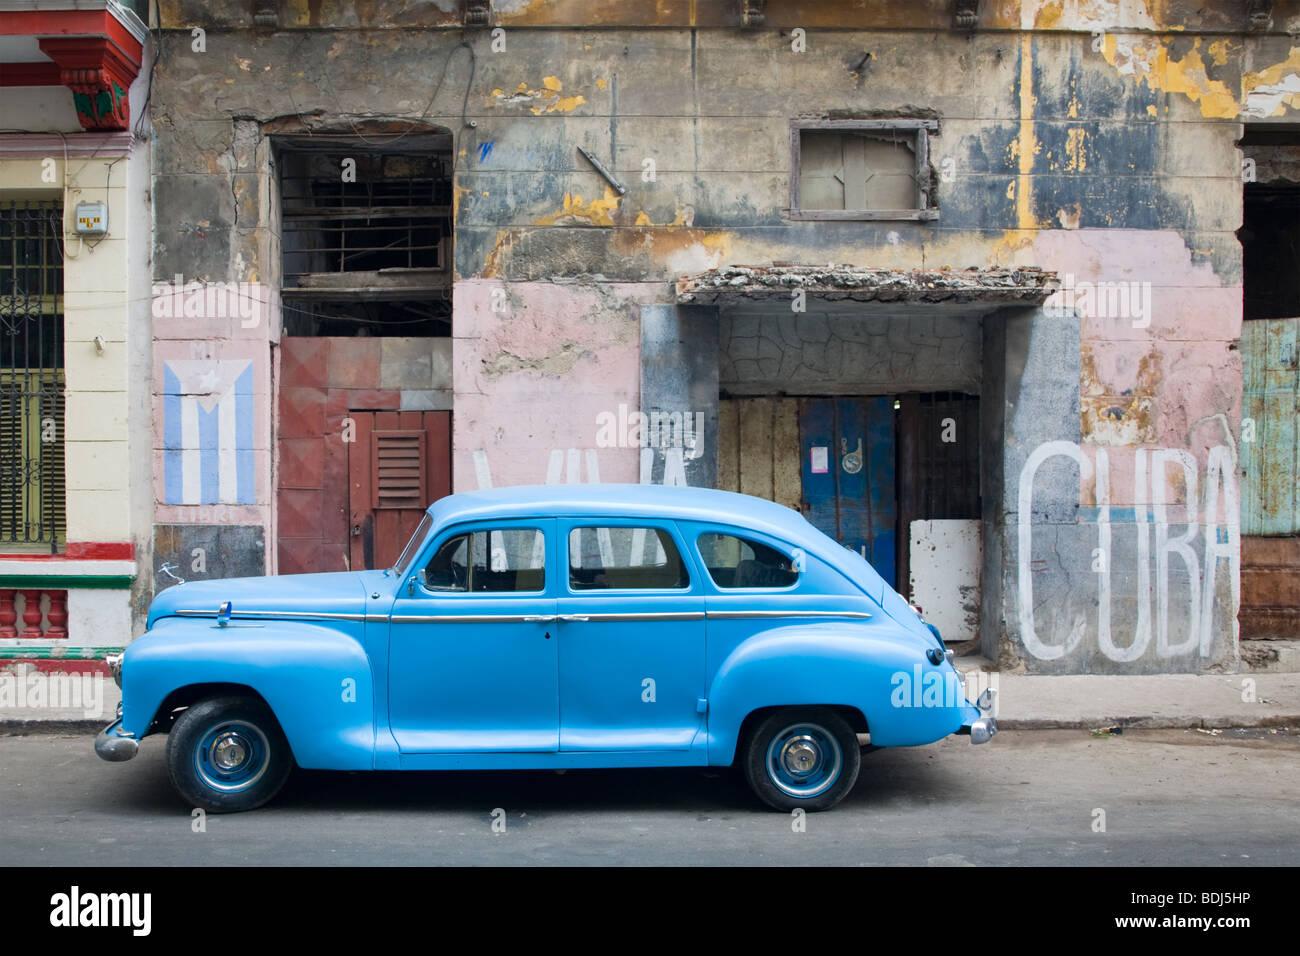 Classic 1930s car parked in Havana Centro, Cuba - Stock Image